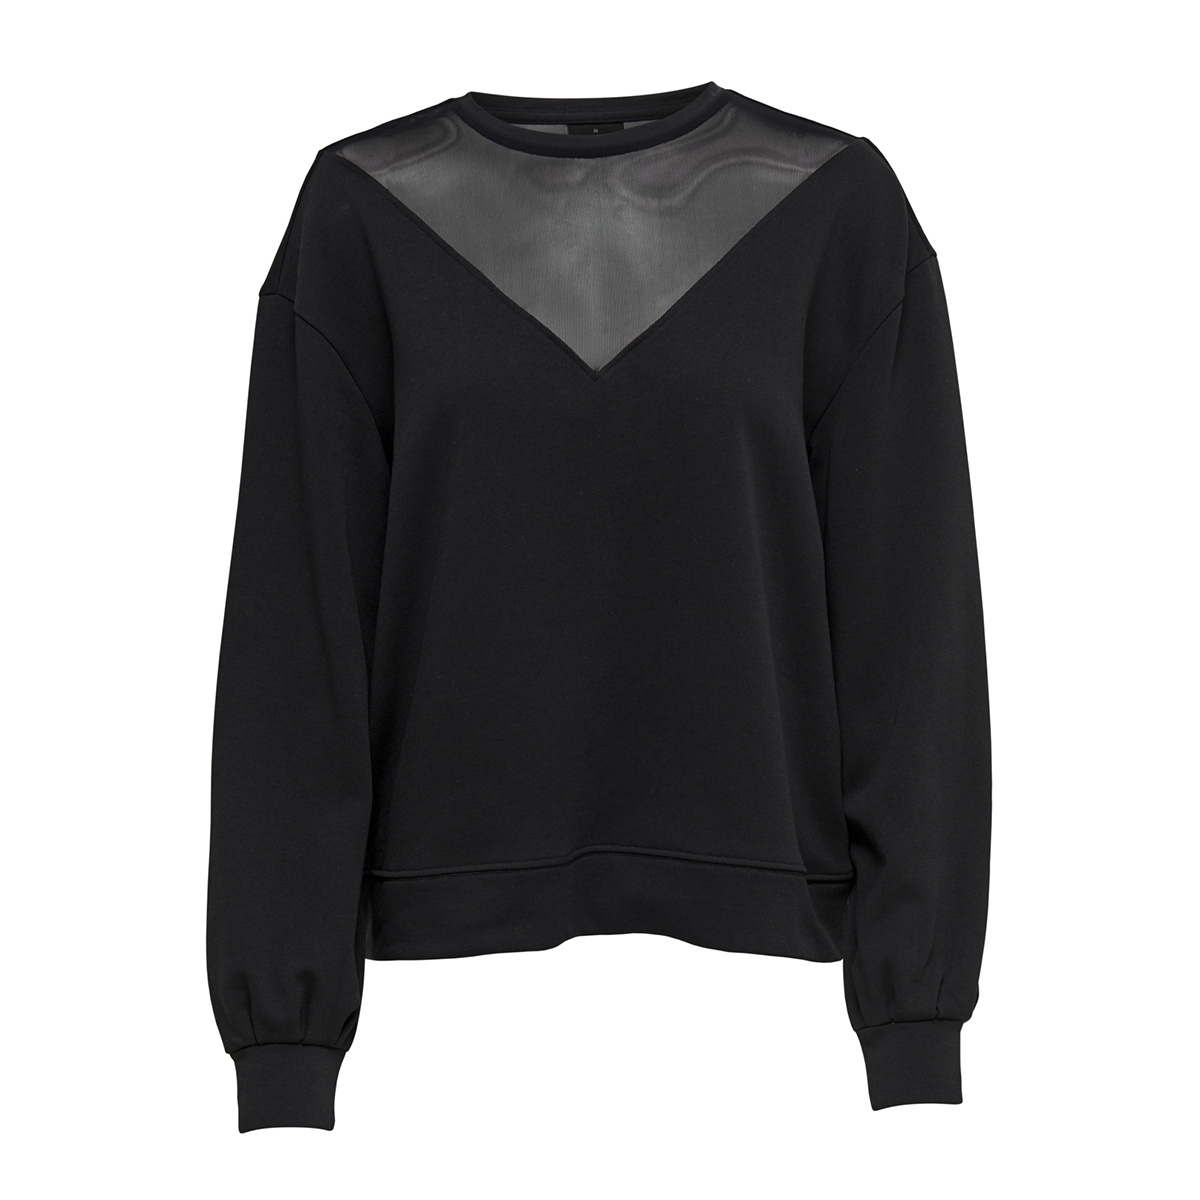 onlelsebeth l/s o-neck sleeve mesh 15168787 only sweater black/dtm mesh